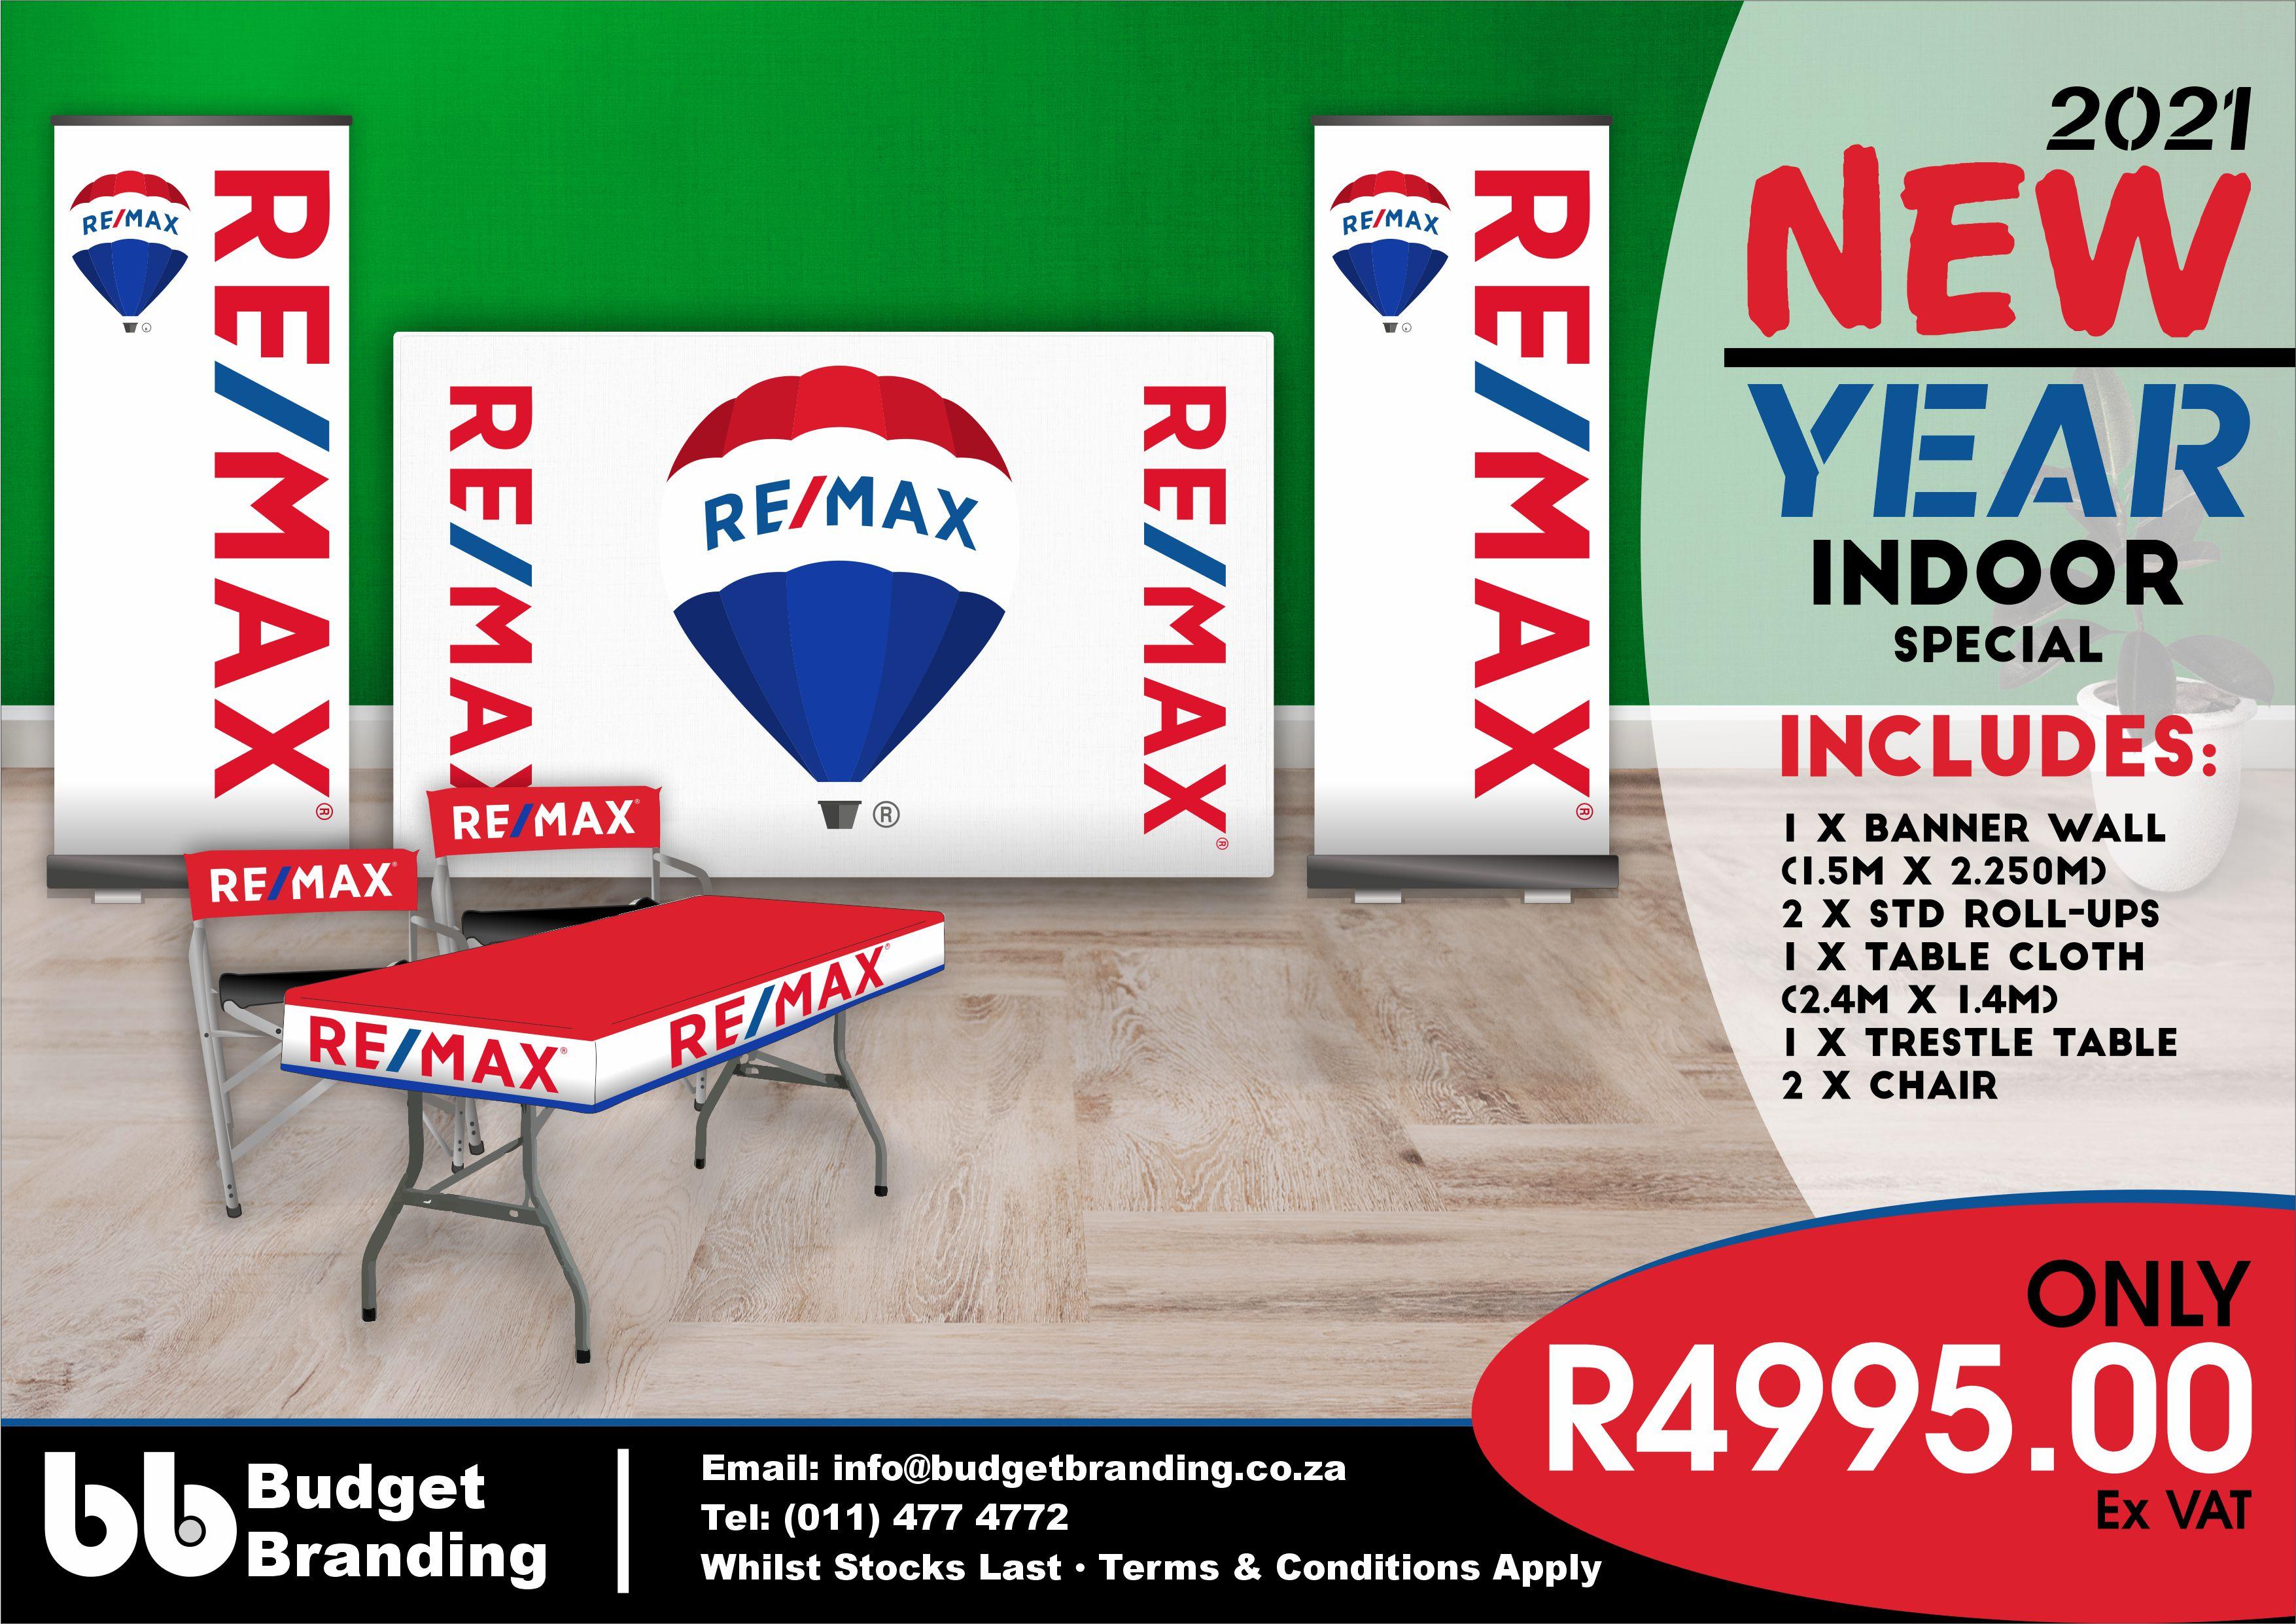 2021 New Year Indoor Special